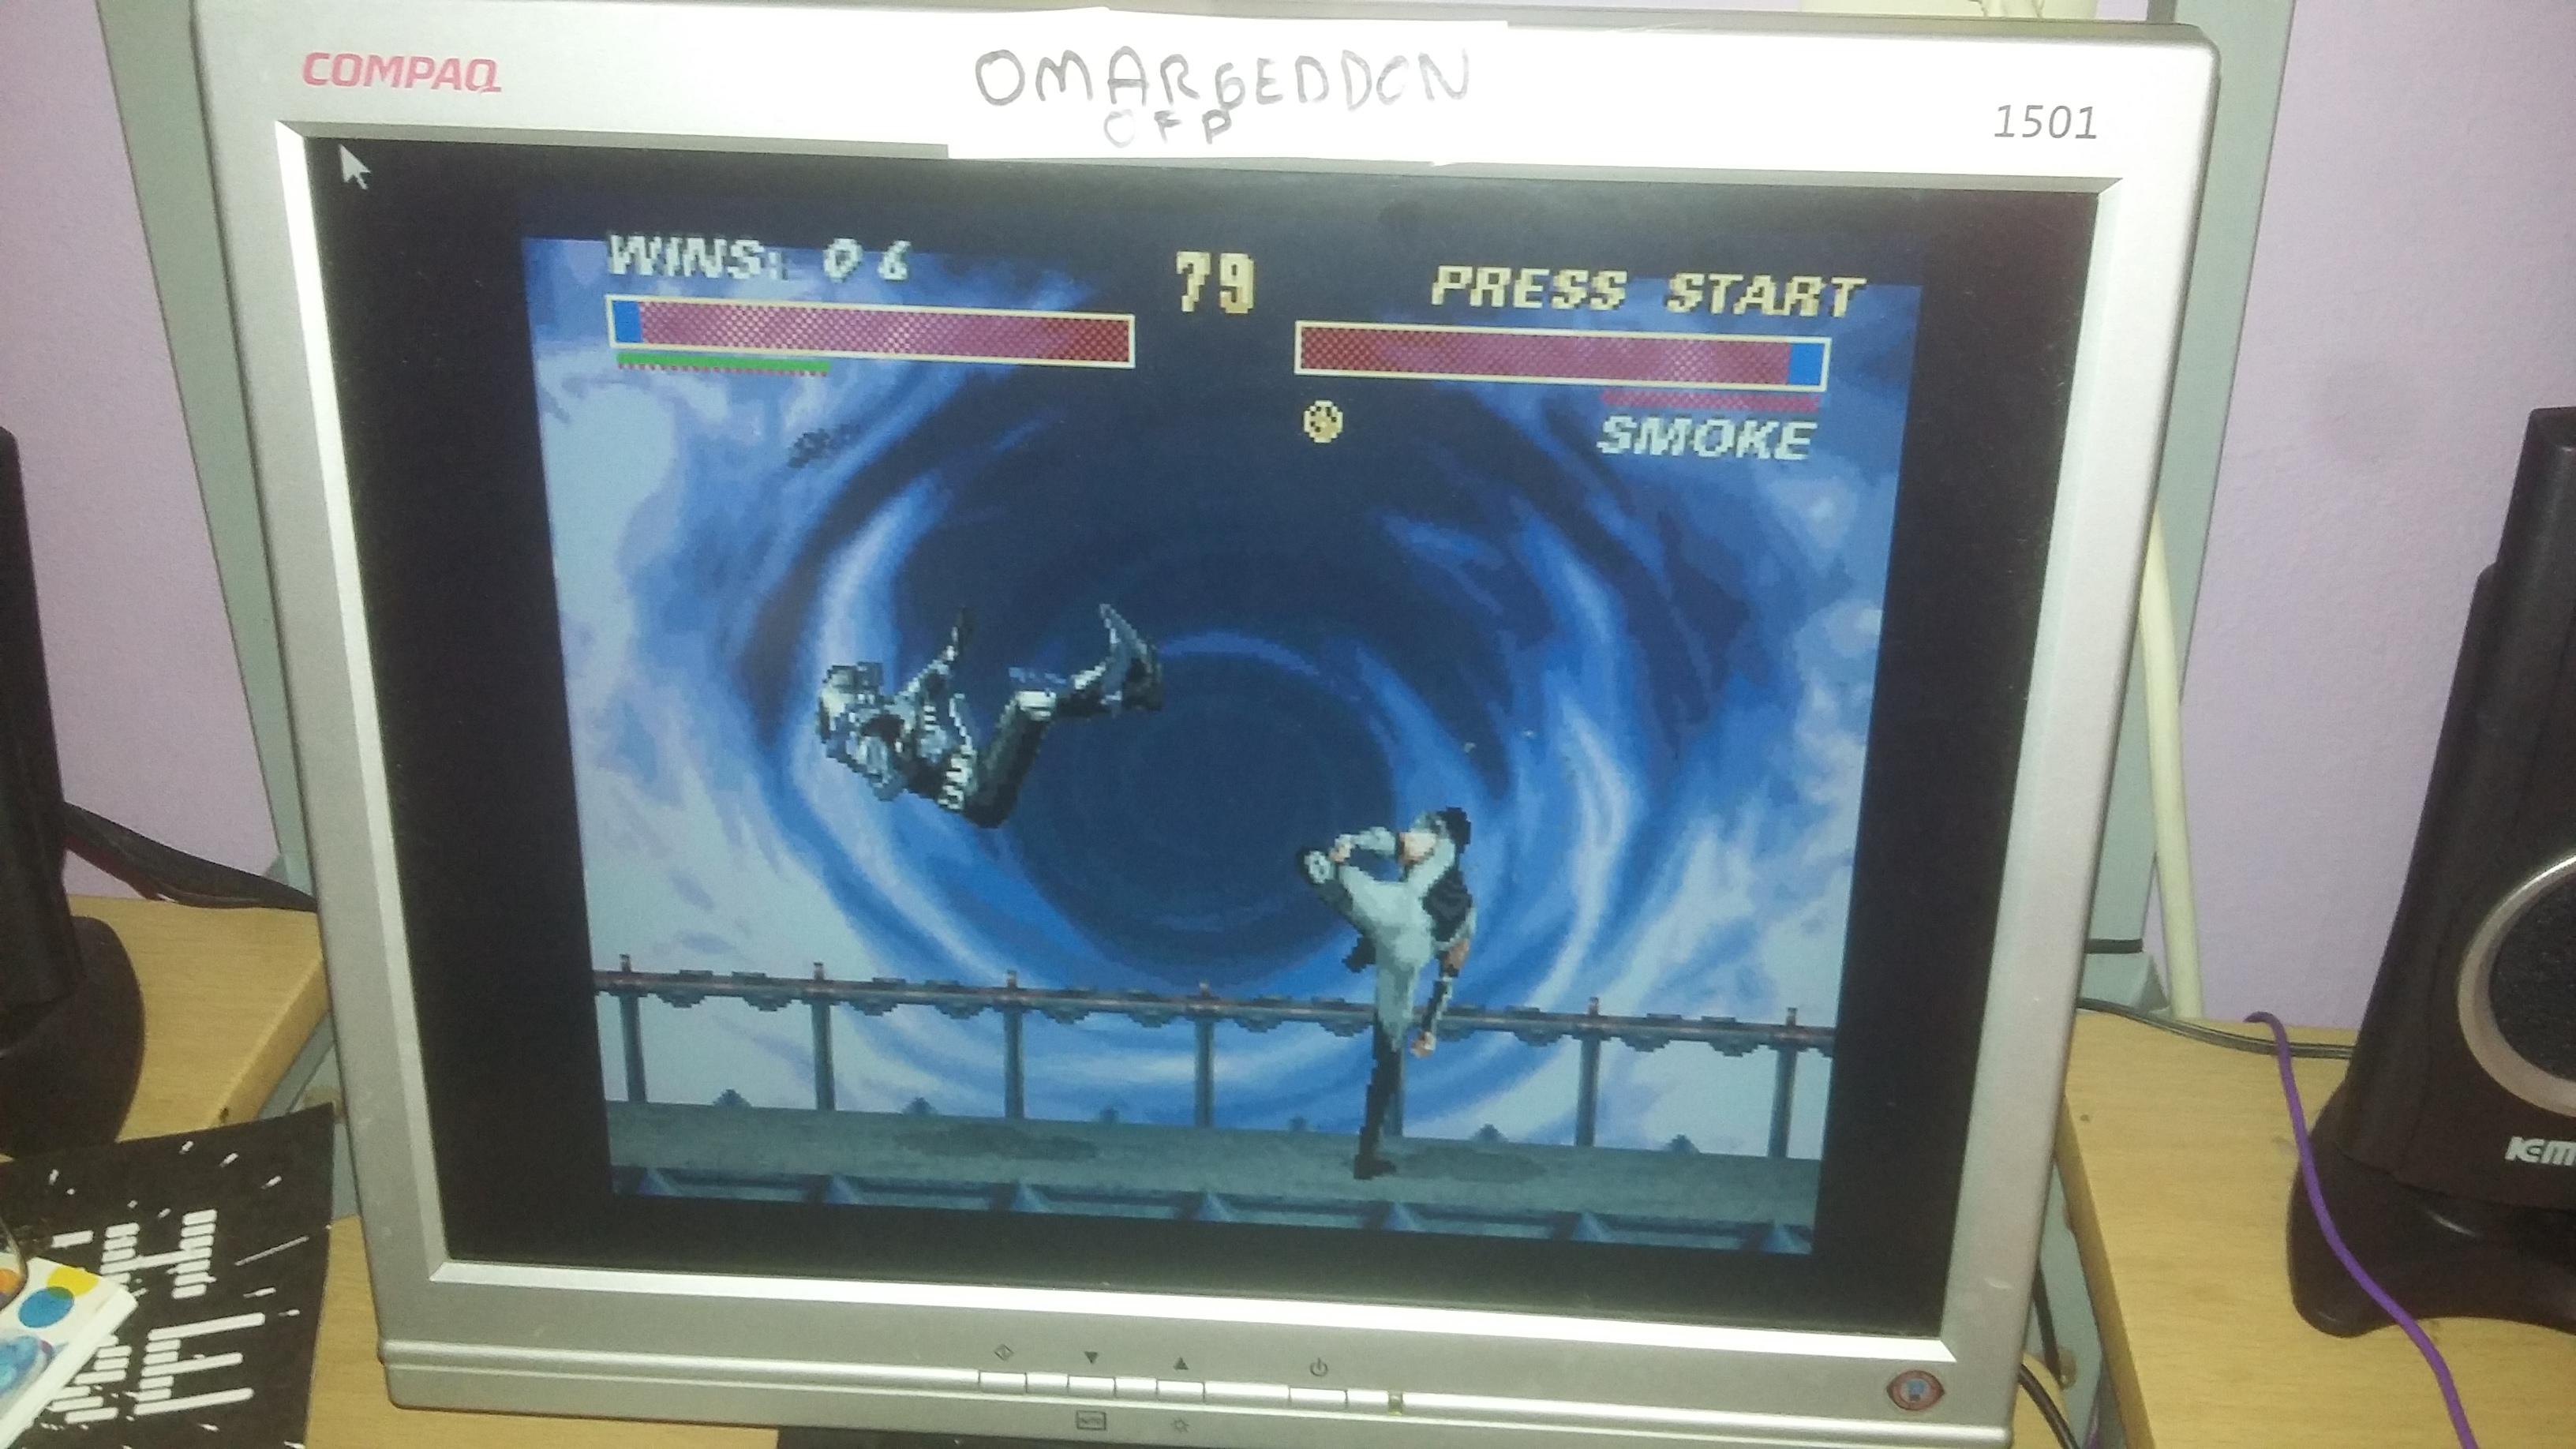 omargeddon: Ultimate Mortal Kombat 3 [Win Streak] (SNES/Super Famicom Emulated) 6 points on 2016-10-14 17:30:08